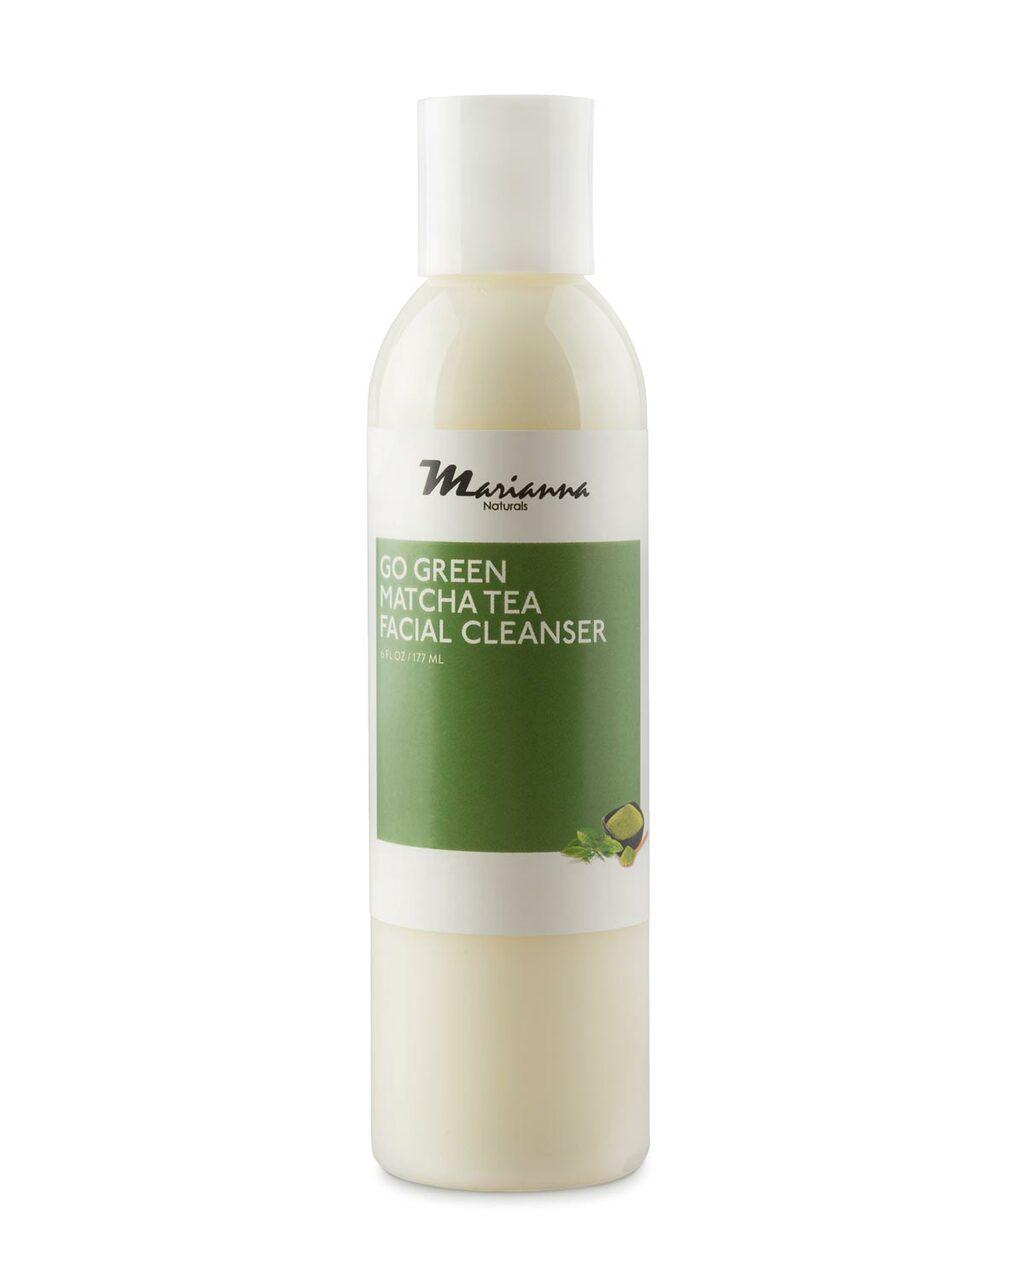 Go Green Matcha Tea Facial Cleanser - Primary Thumbnail